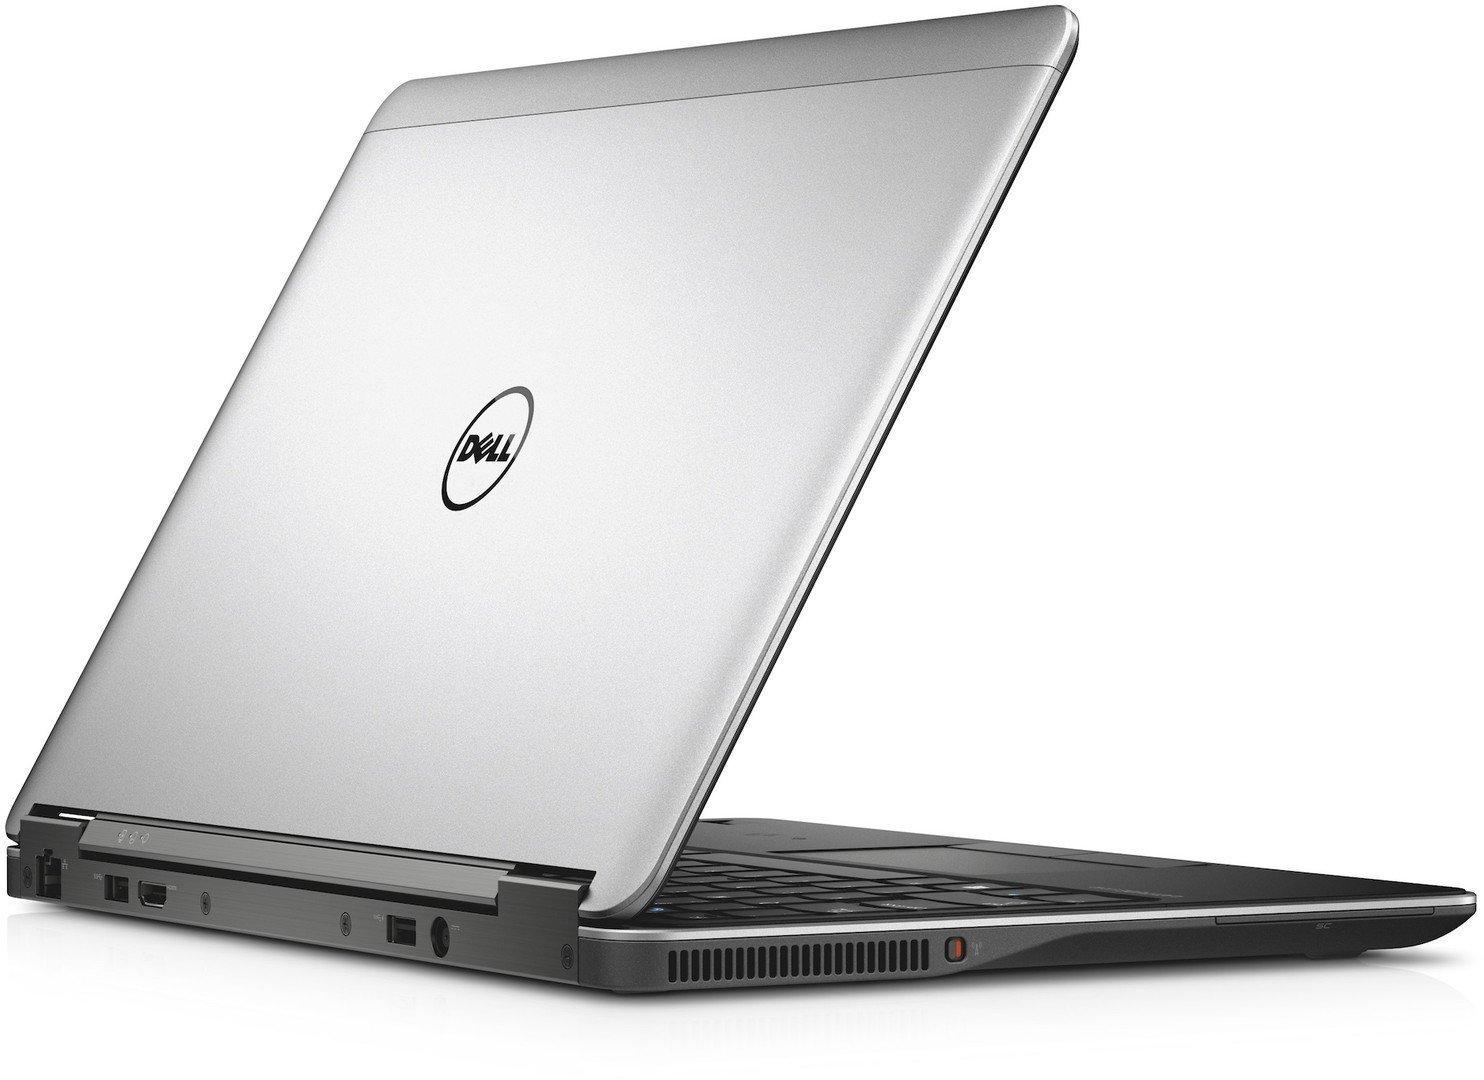 "Dell Latitude E7240 UltraBook Laptop: 12.5"" (1366x768) Anti-Glare | Intel i5-4310U | 128GB SSD | 4GB | Wireless-AC + Bluetooth | Back-lit | Windows 10 Pro Certified Refurbished)"